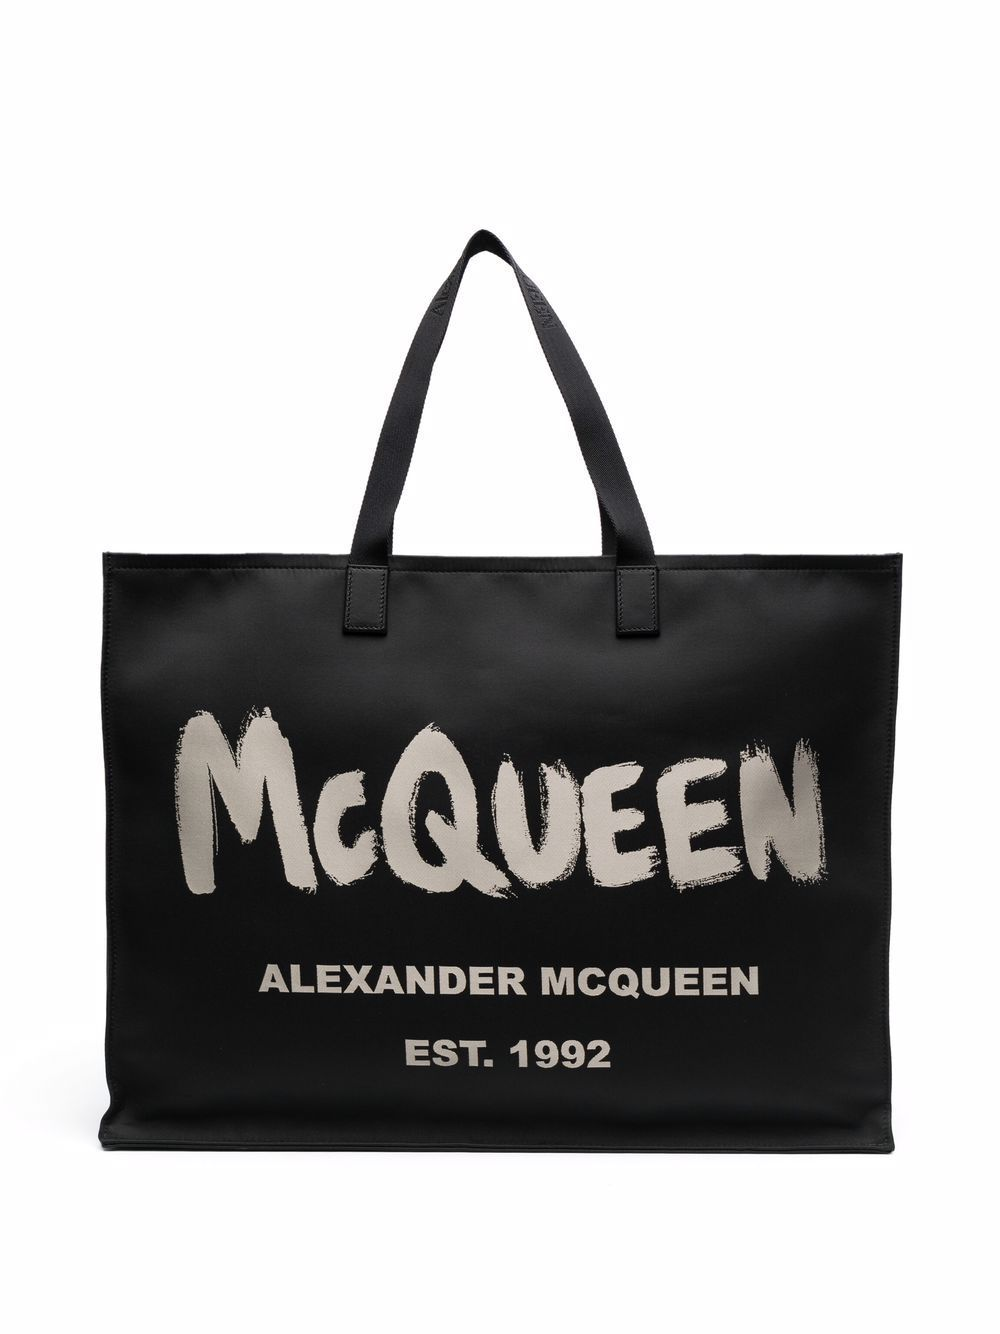 Alexander mcqueen borse... nero